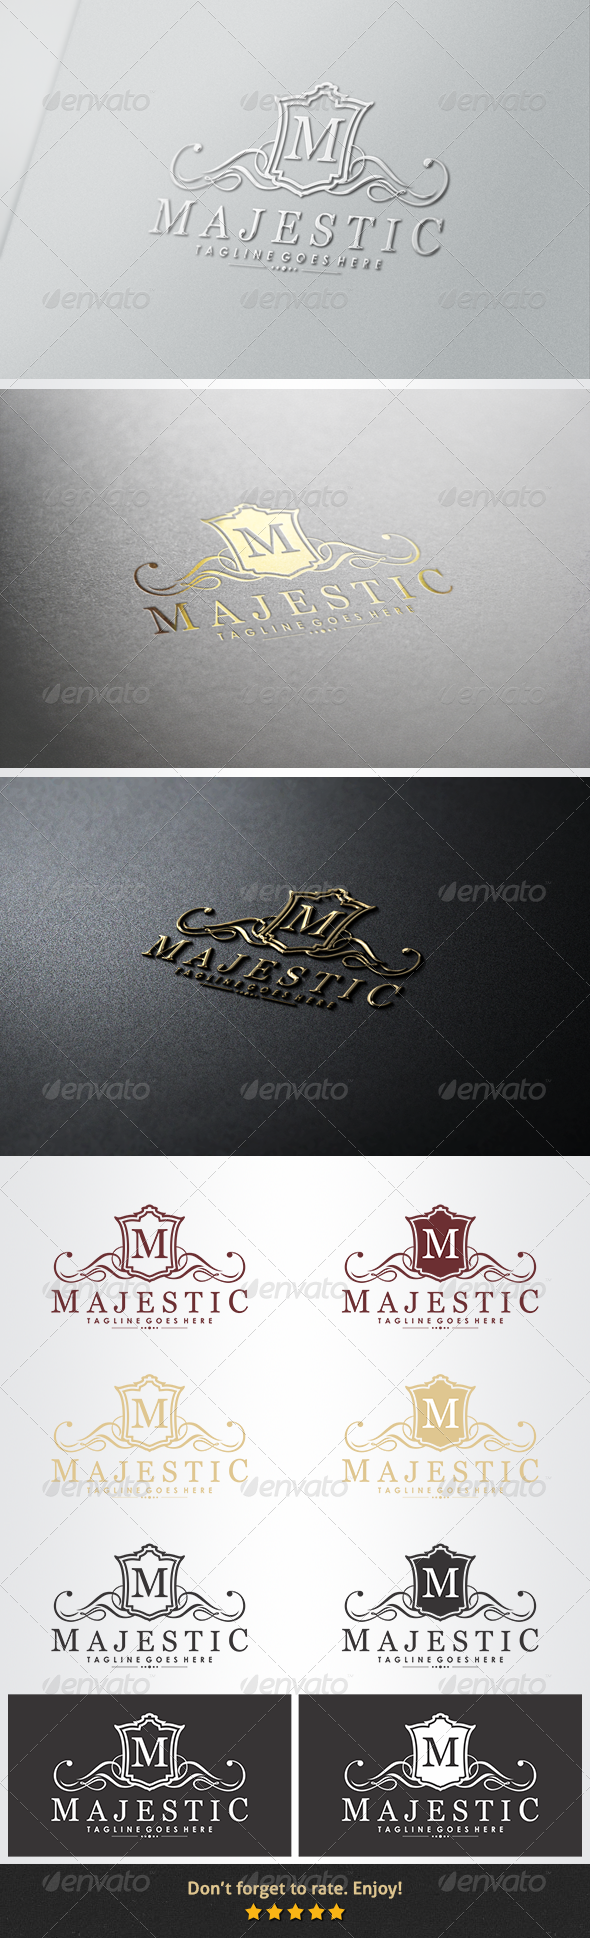 Majestic Logo - Crests Logo Templates